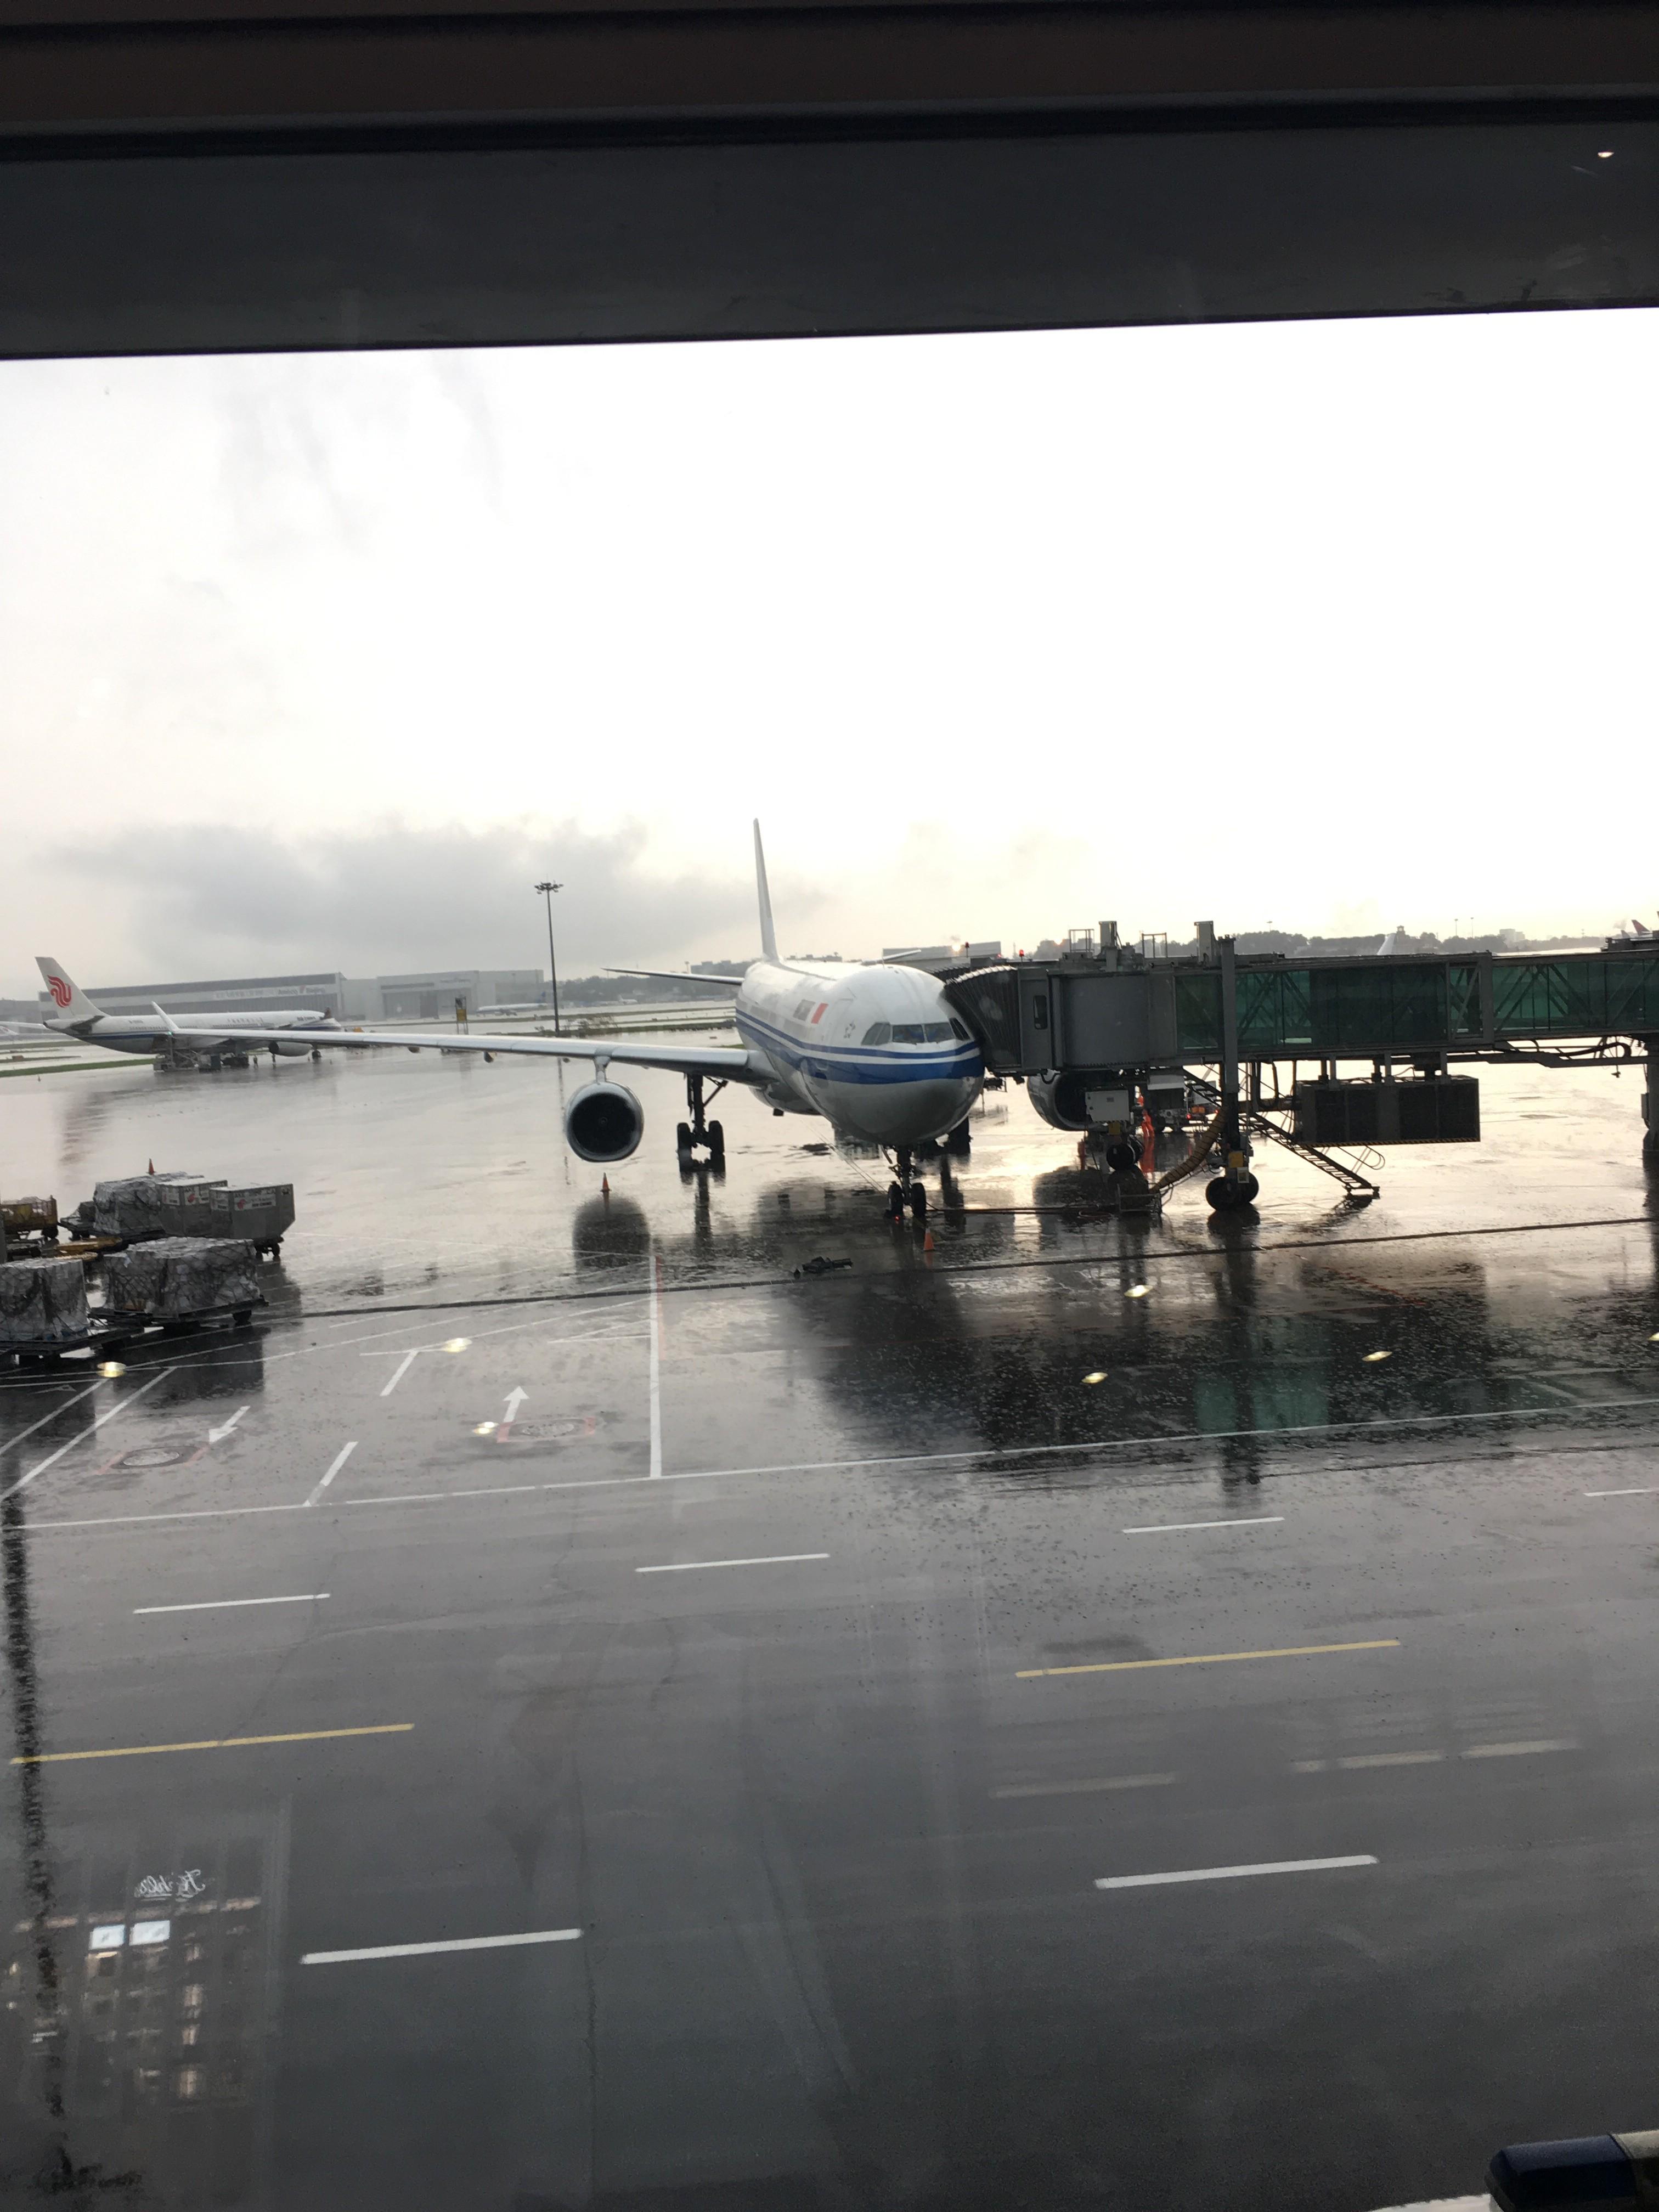 Re:[原创]~骚年飞行篇~补充半年前的香港之路,国航CA111 PEK-HKG,有幸坐到大擦第50架77W AIRBUS A330-300 B-8383 中国北京首都国际机场